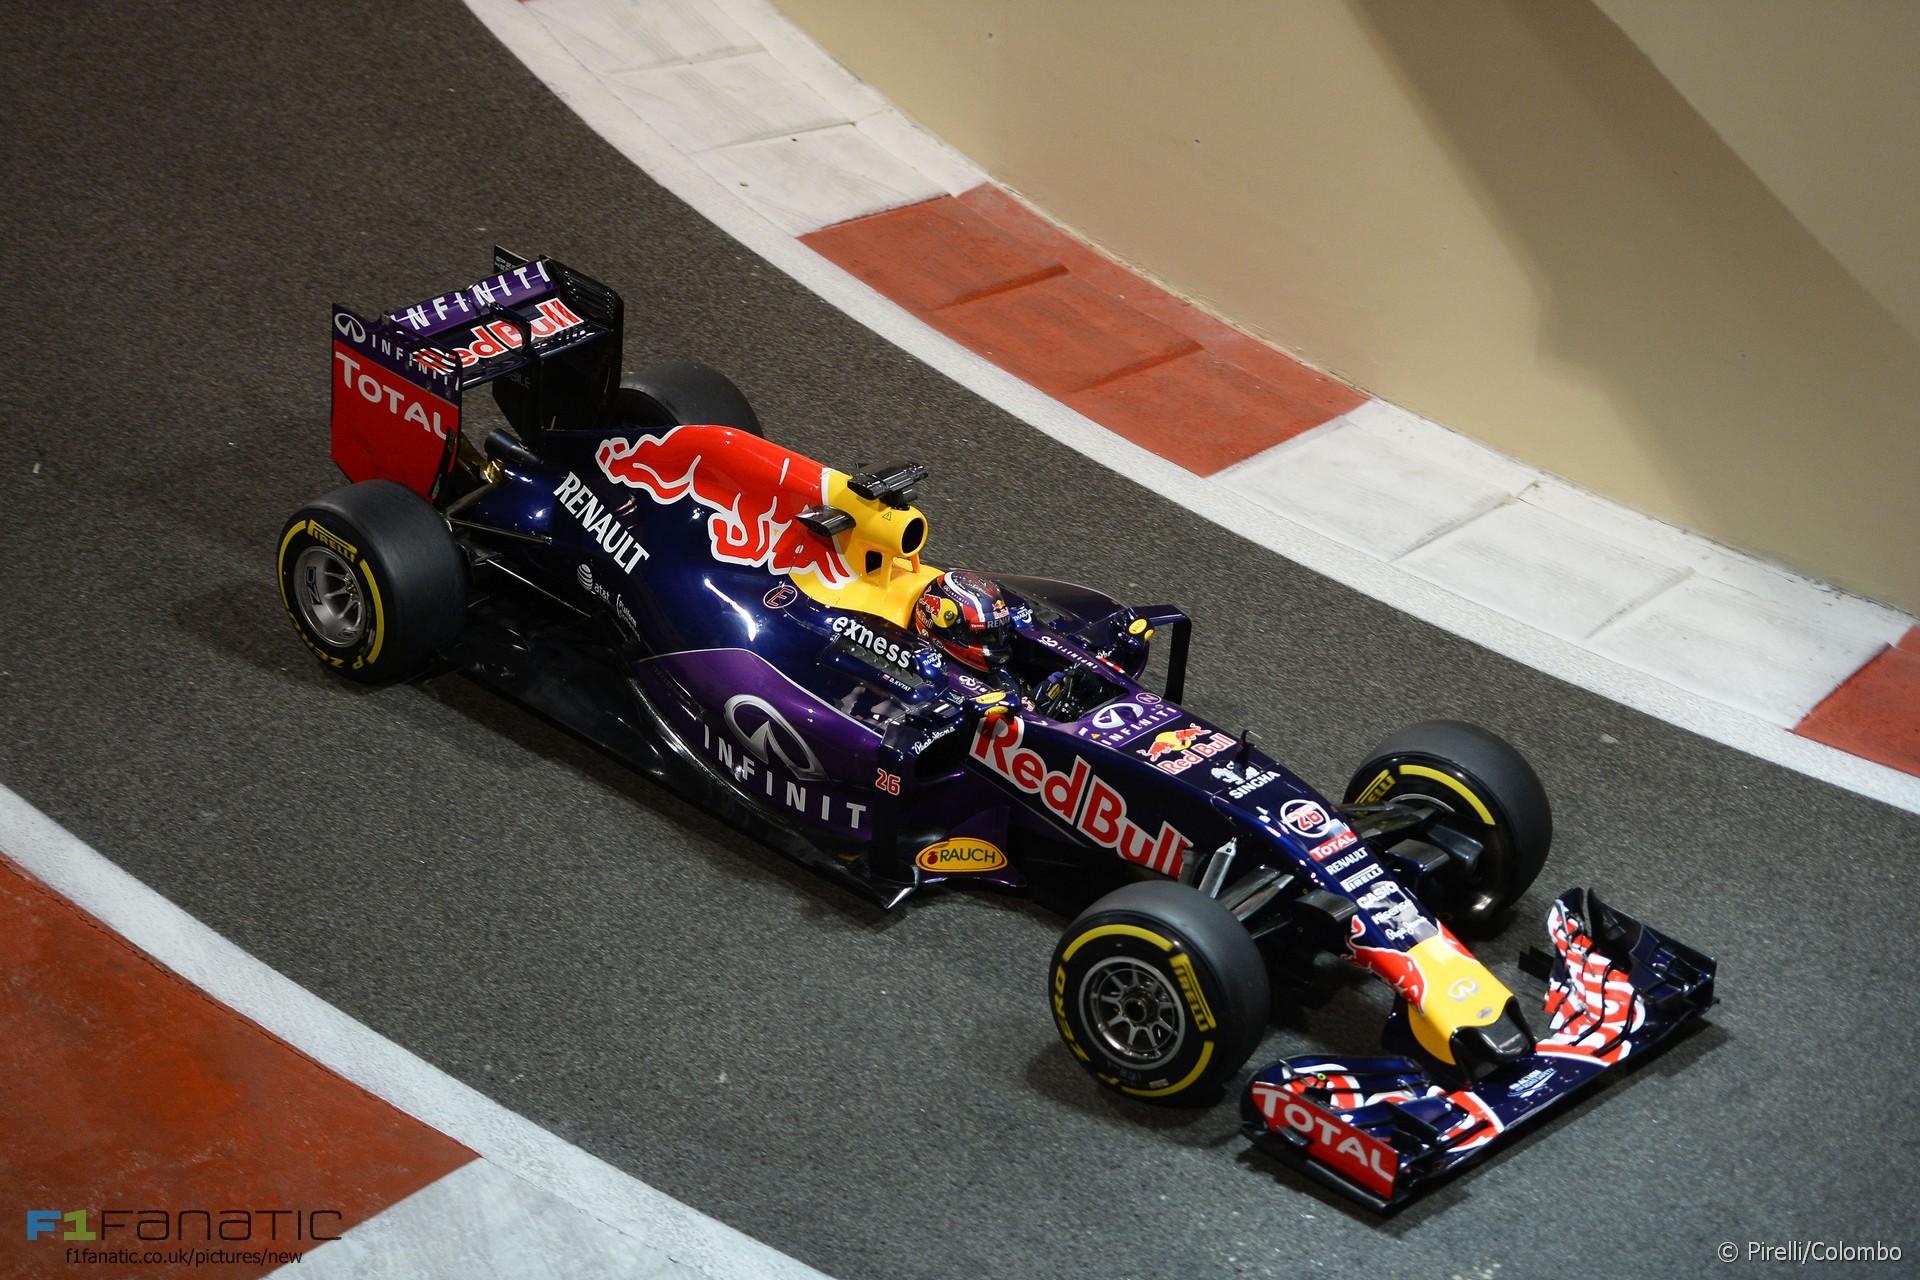 Daniil Kvyat, Red Bull, Yas Marina, 2015